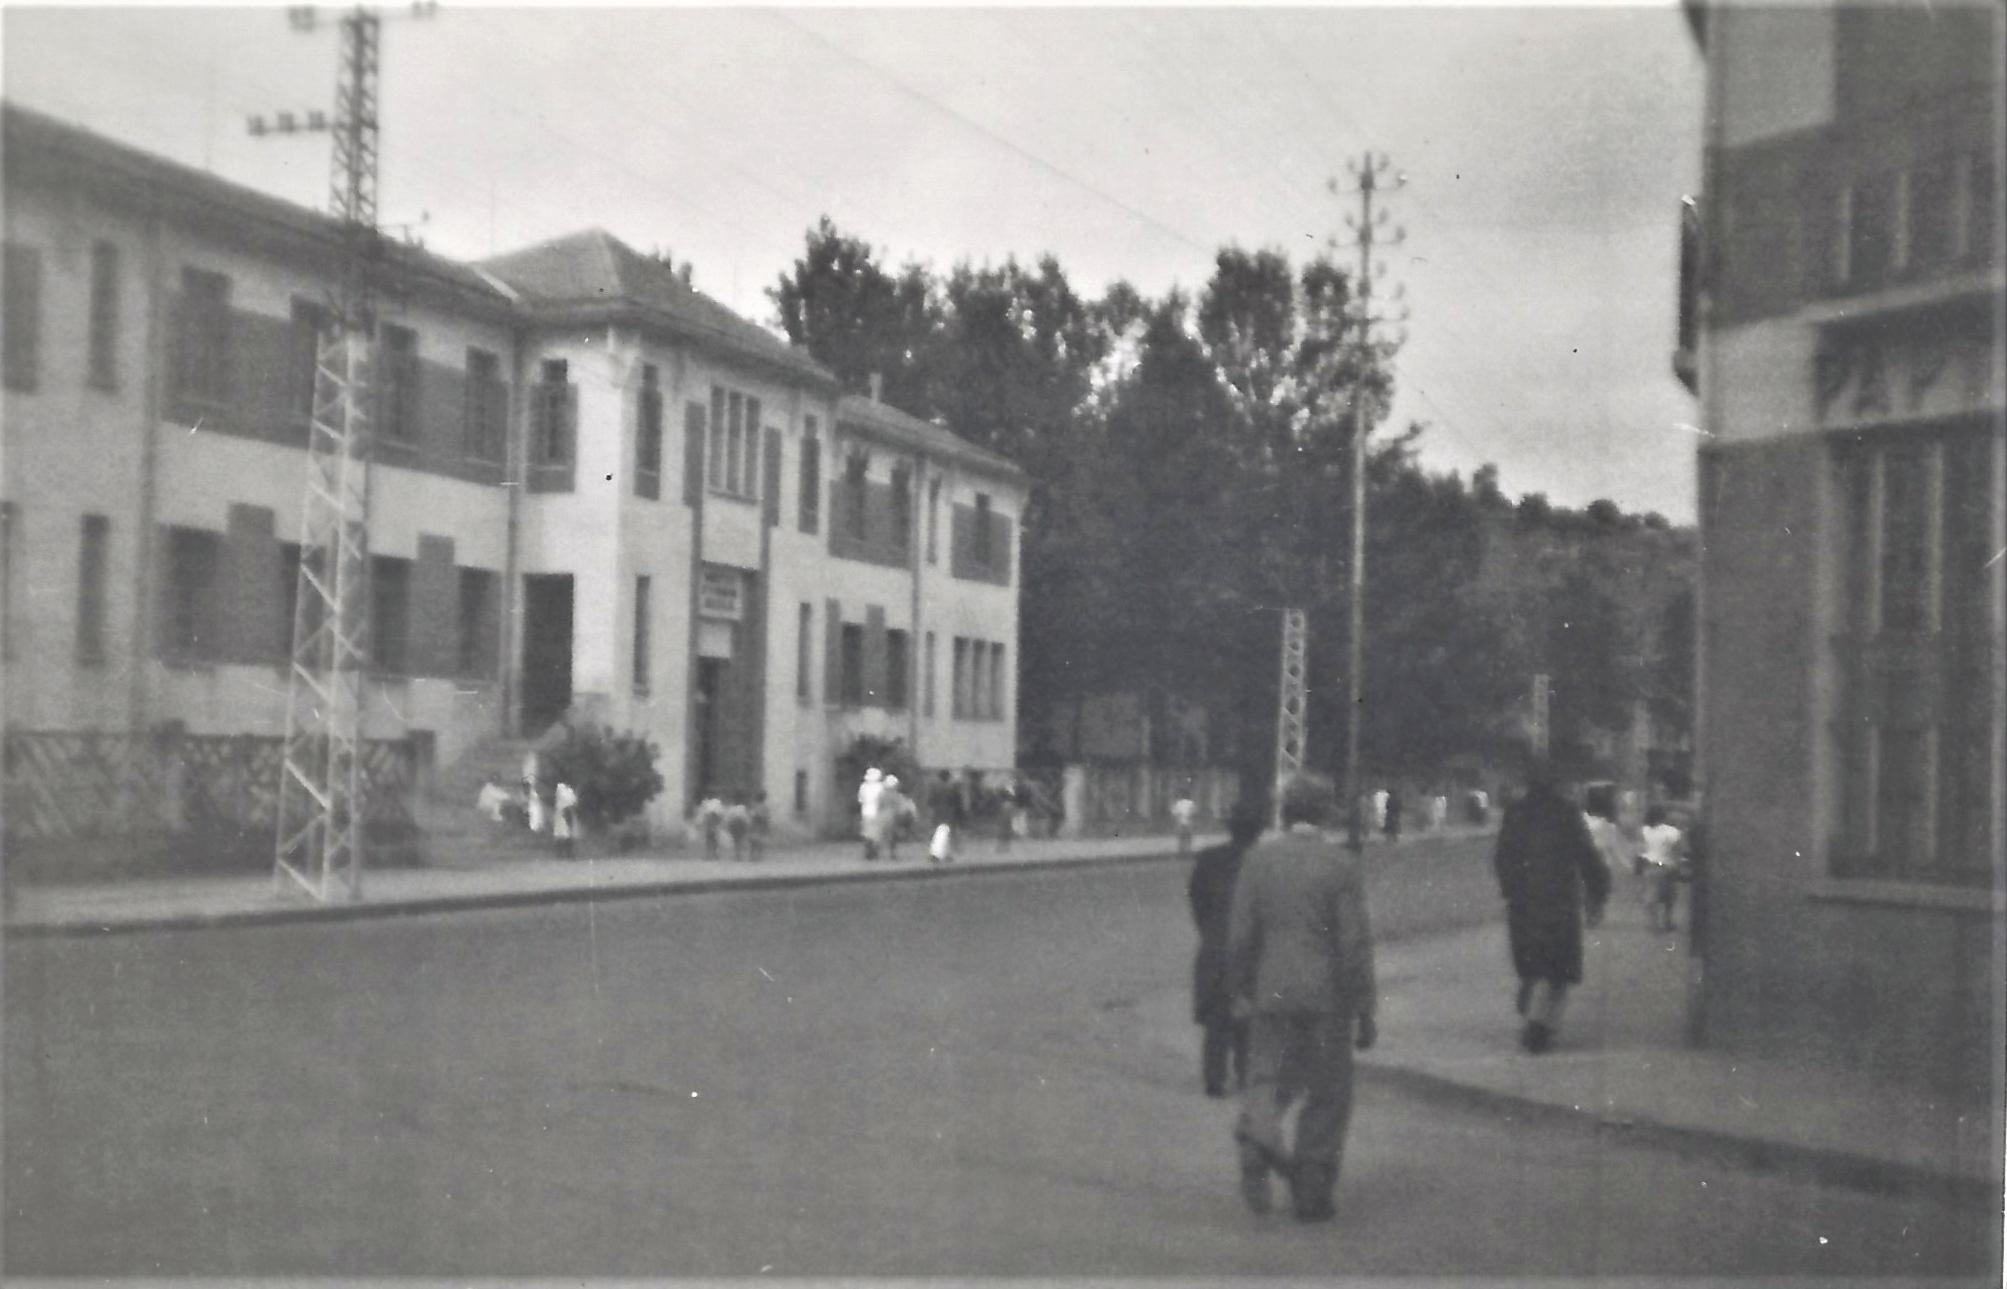 Institut d'hygiène sociale, avenue de la Réunion, Tananarive